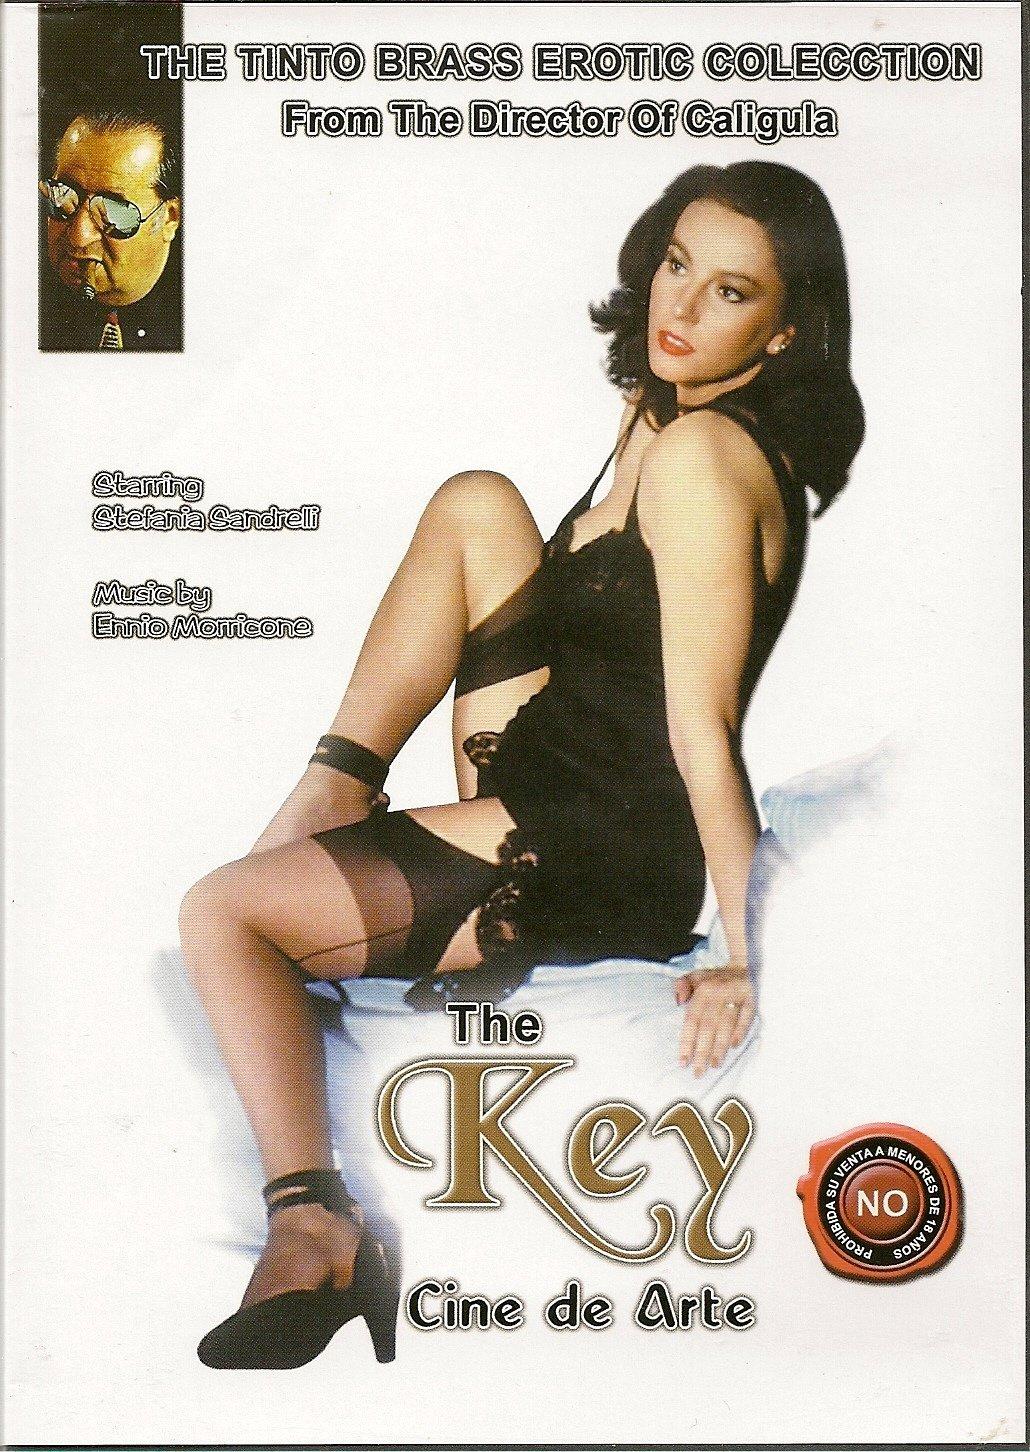 Erotic star season 1 dvd